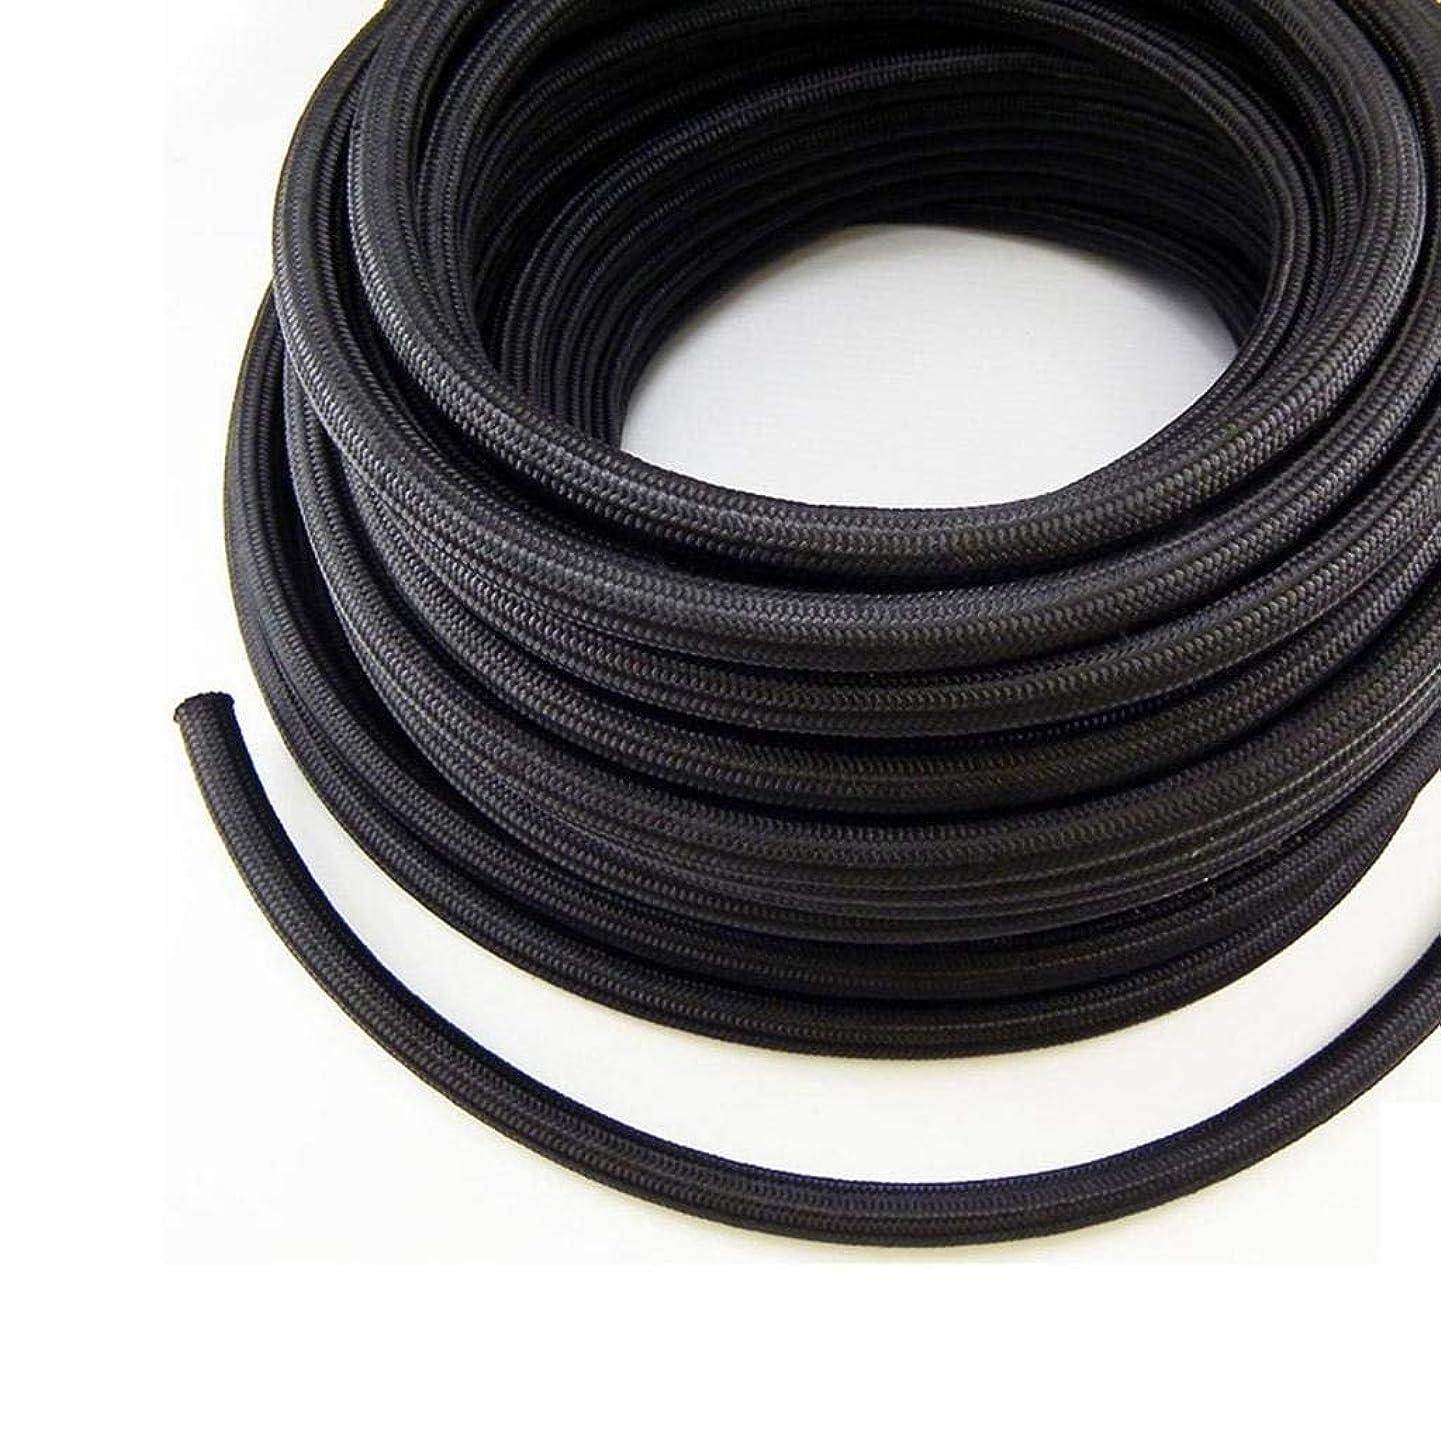 Nylon Braidied Oil Fuel Gas Line Hose 10FEET (Black, AN-10)